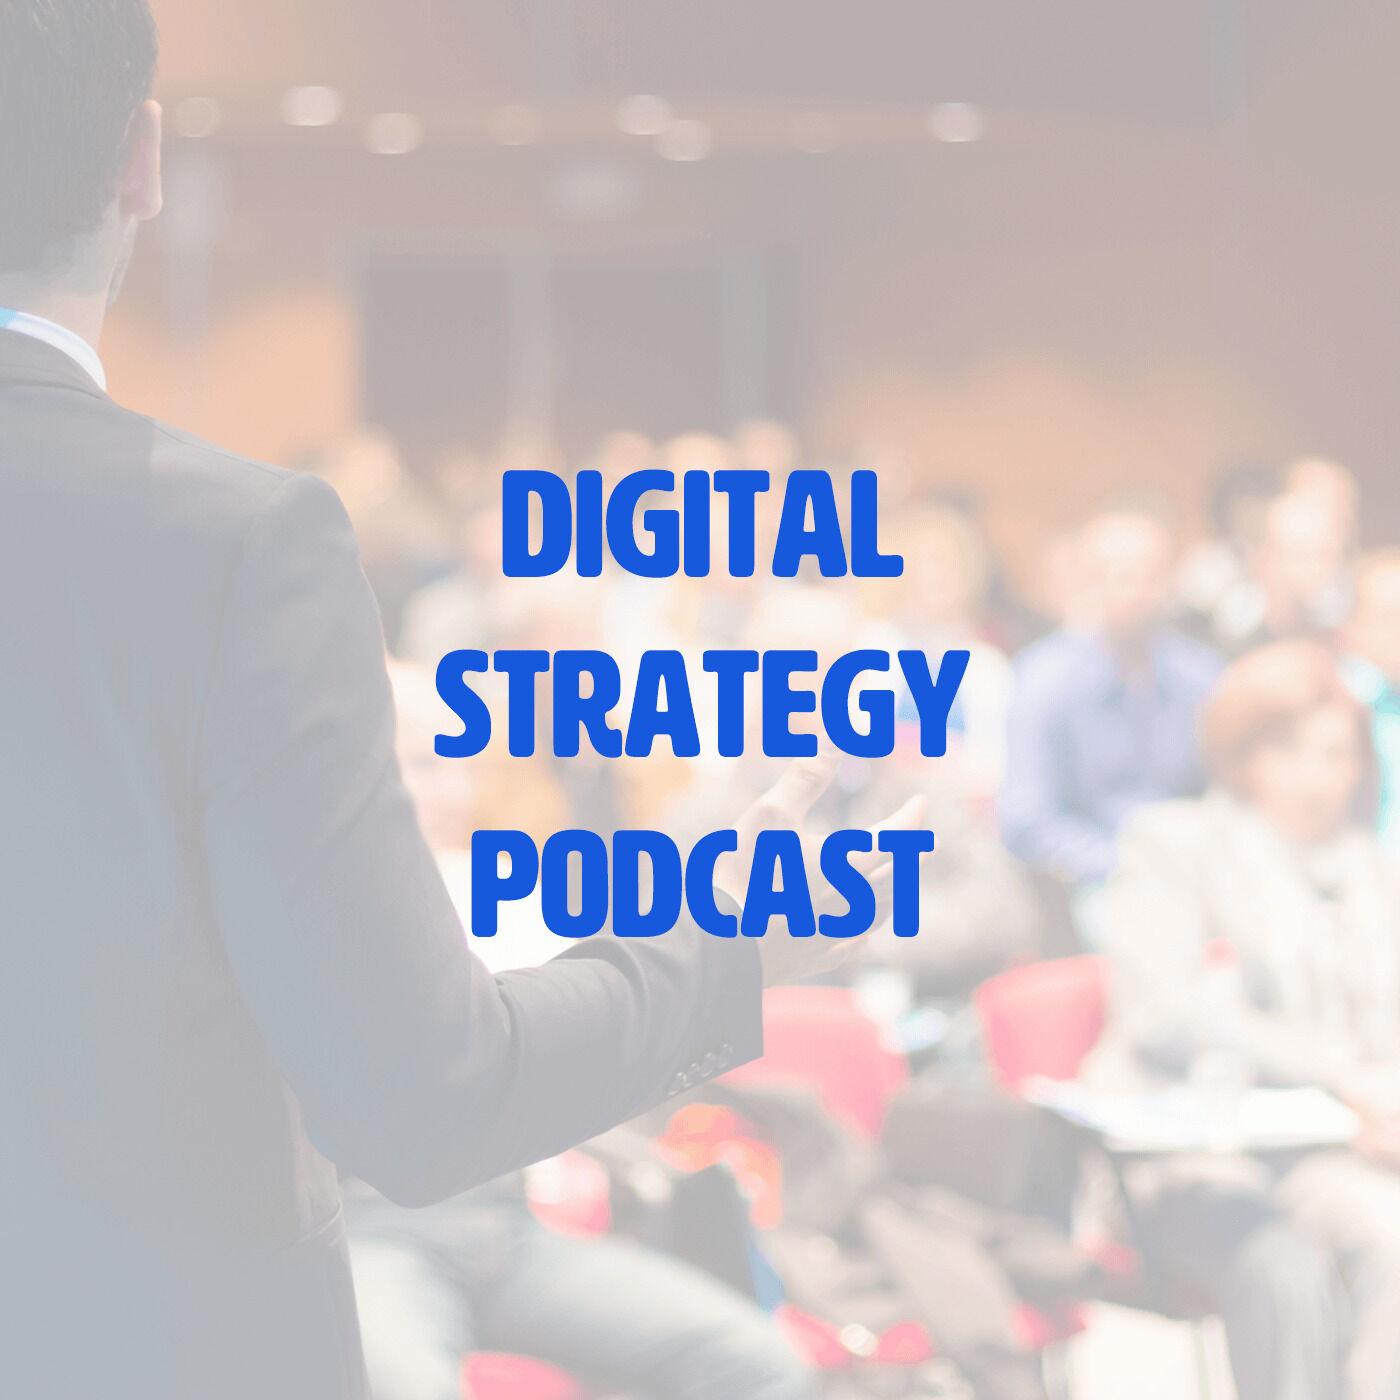 Digital Strategy podcast